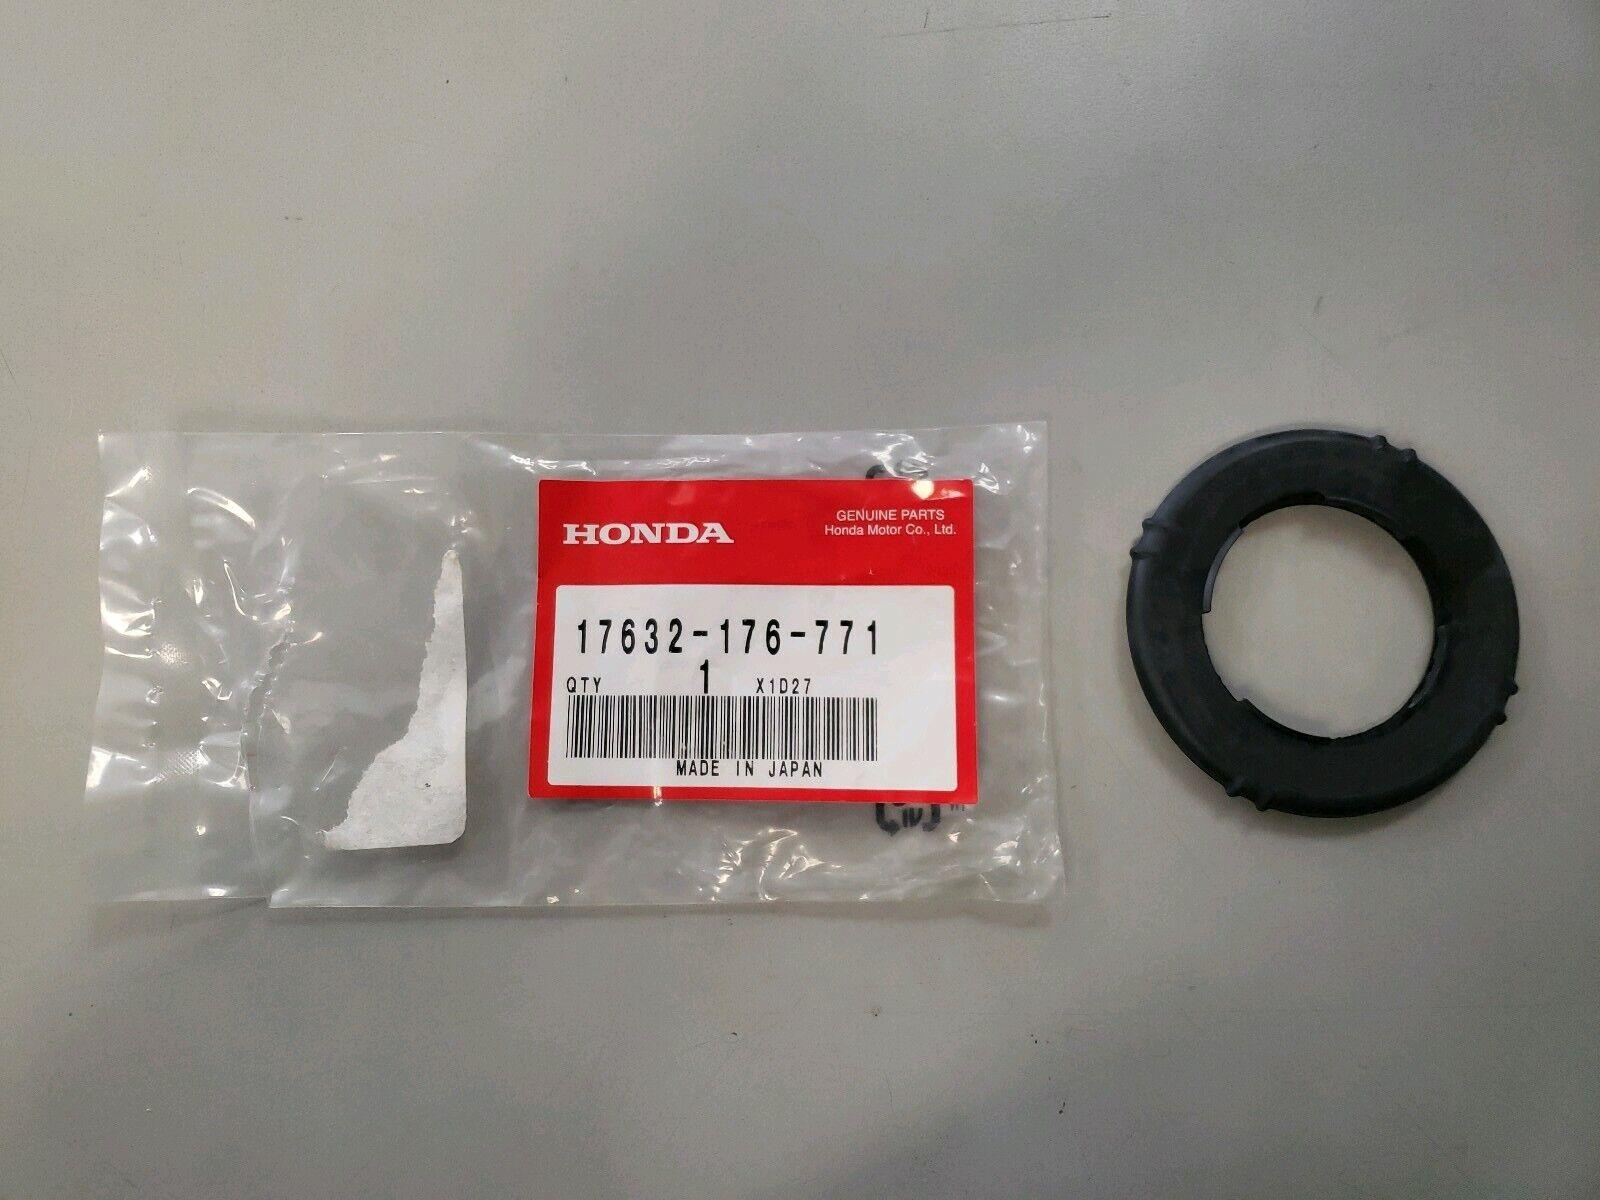 DP 5040-500 Gas Cap Gasket Fuel Filler Cap Seal Compatible with Honda